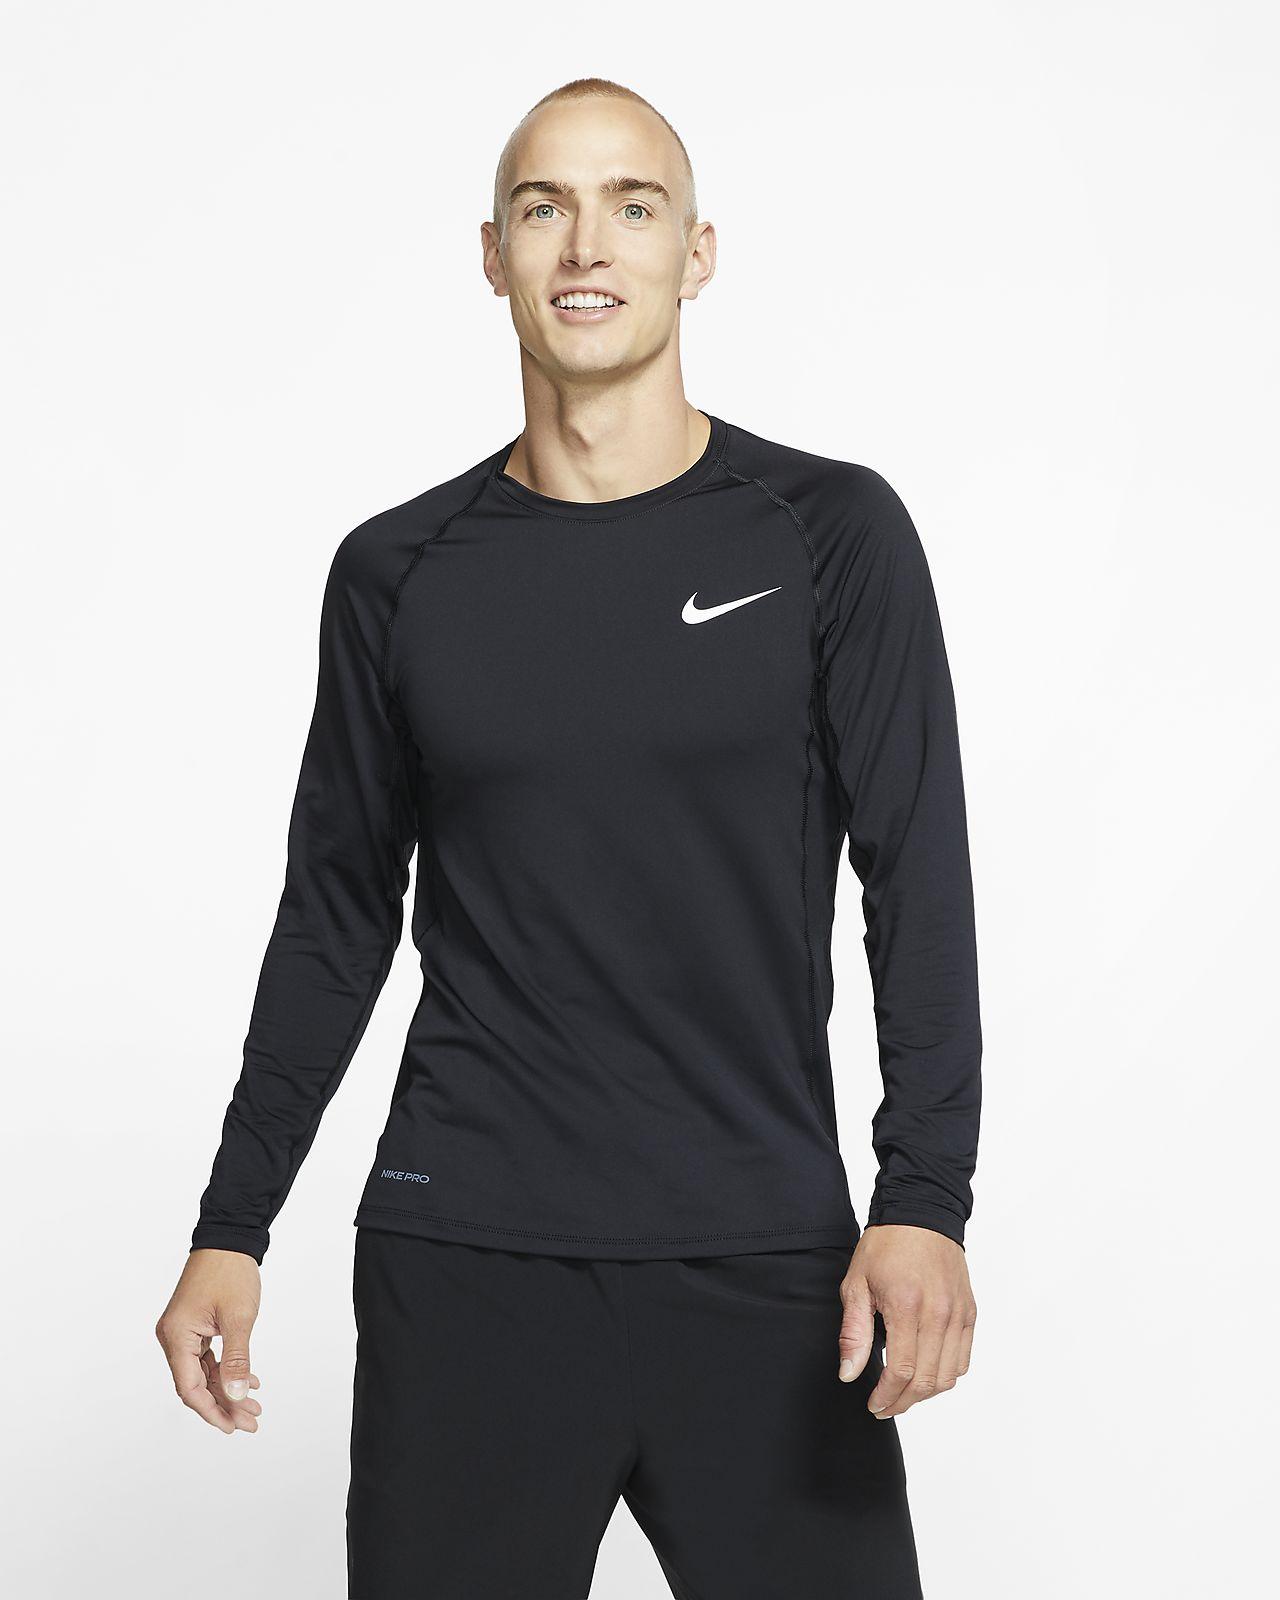 Nike Pro Men's Long-Sleeve Top